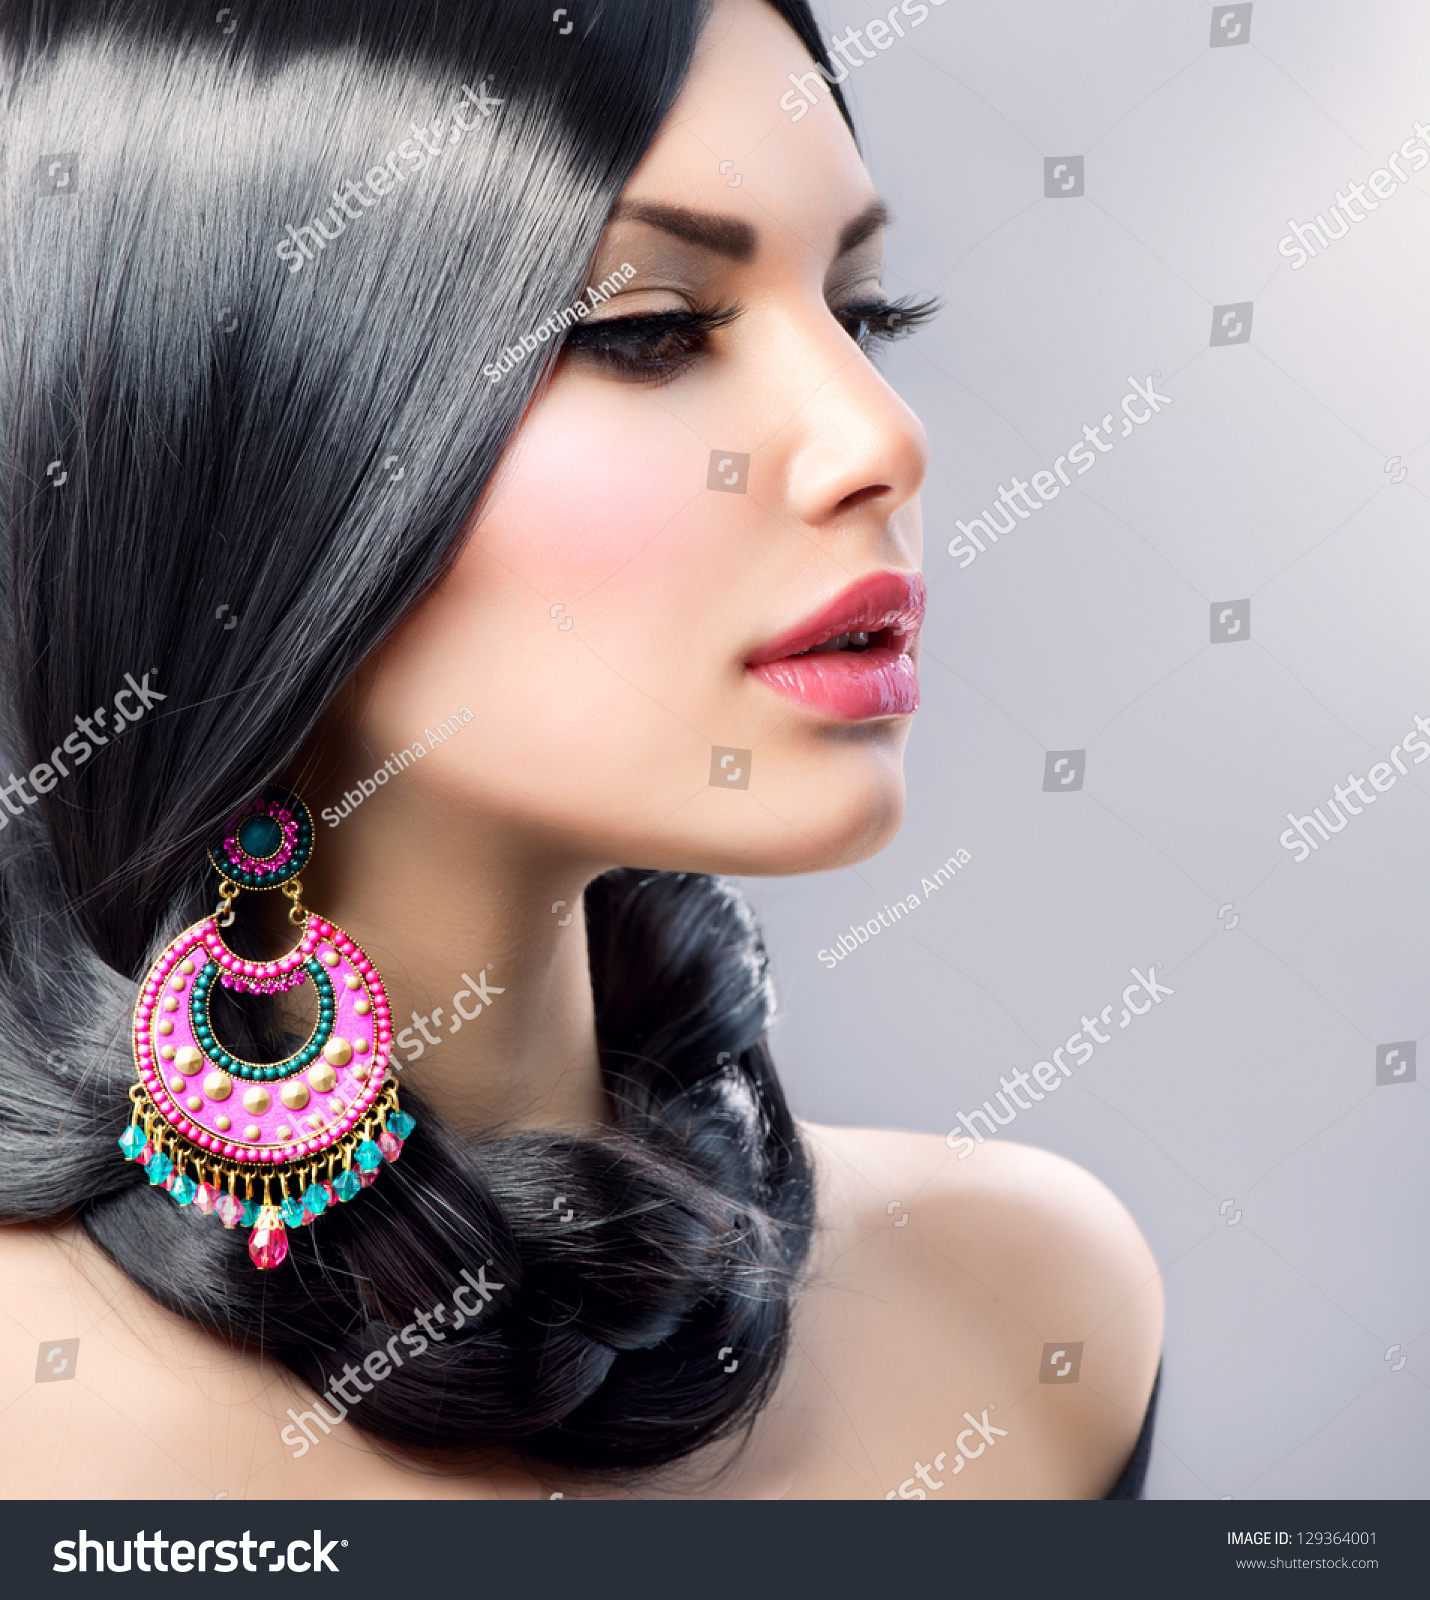 earrings girl hair makeup - photo #44